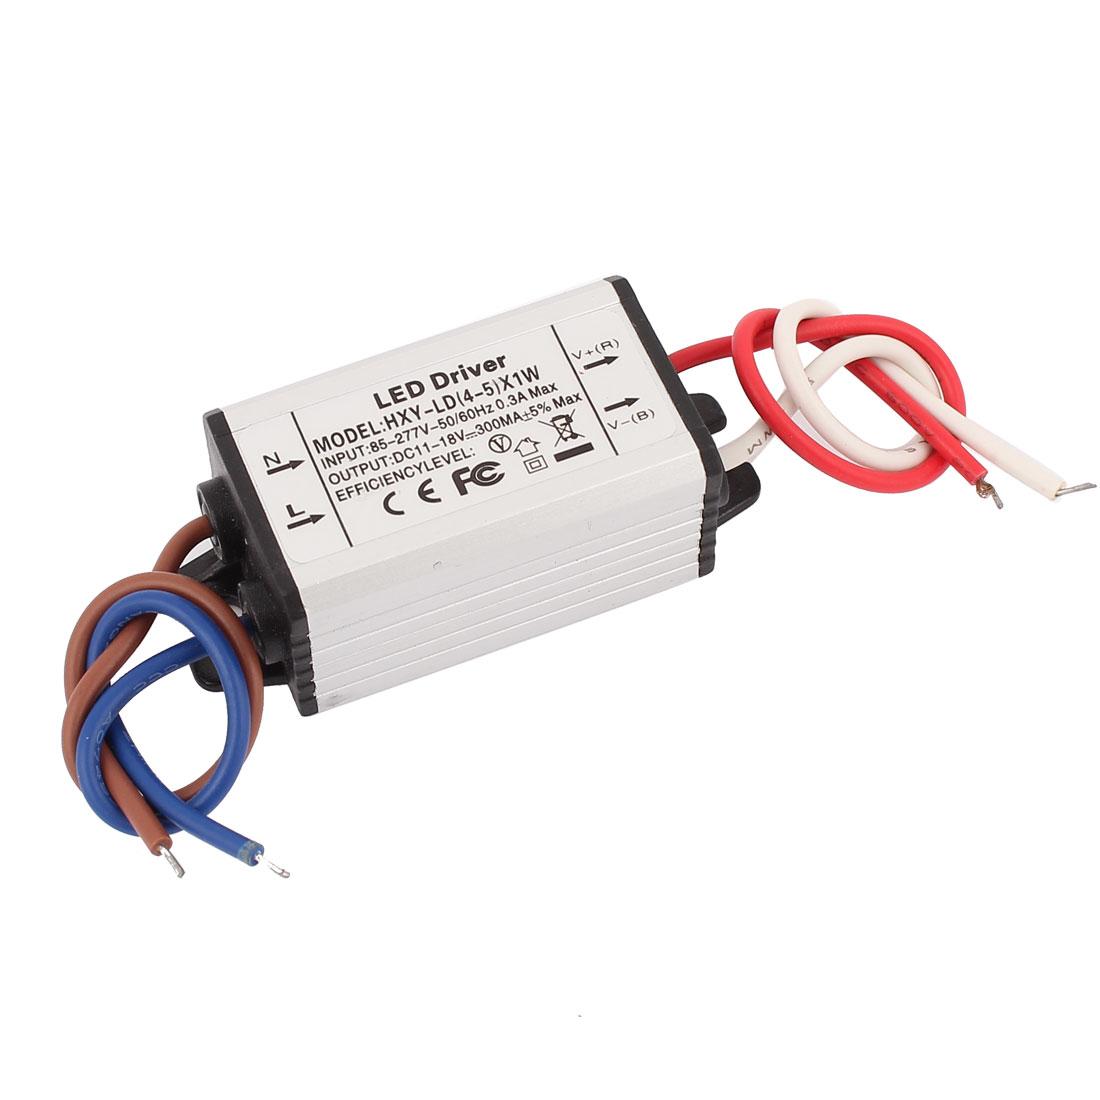 AC 85-277V to DC 11-18V Waterproof Power Supply Driver for LED Strip Light